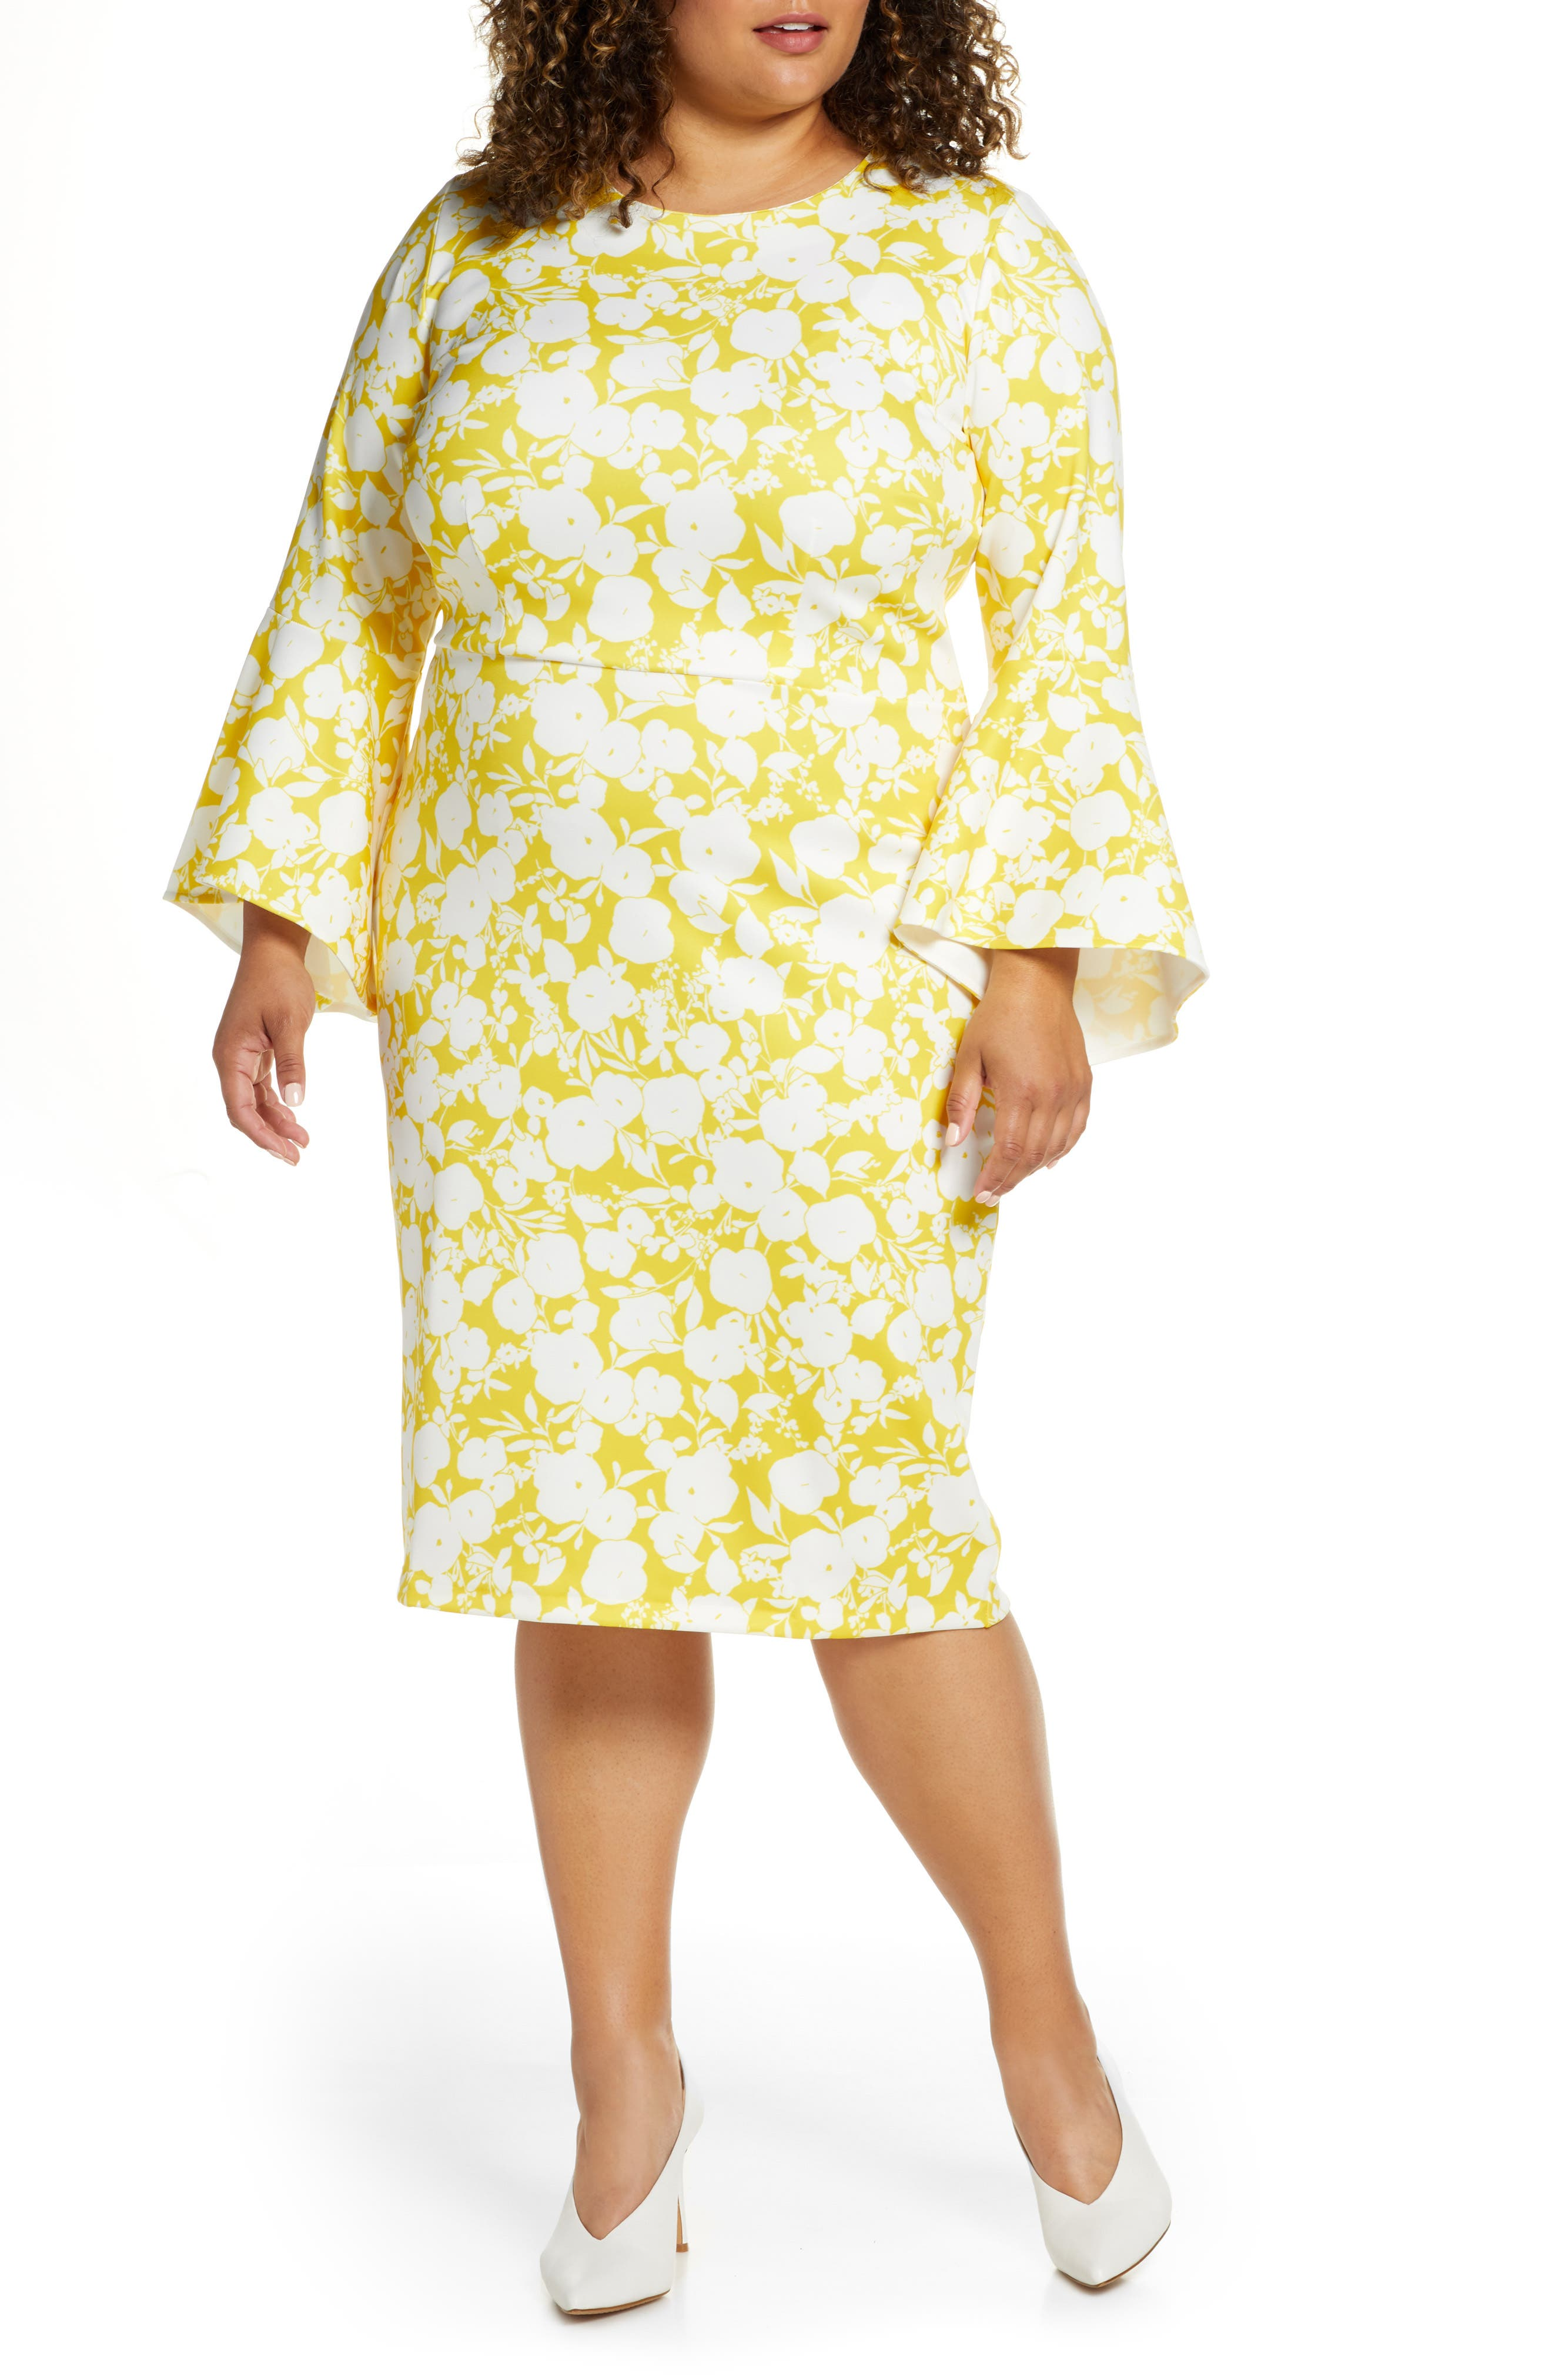 60s 70s Plus Size Dresses, Clothing, Costumes Plus Size Womens Eloquii Long Sleeve Scuba Sheath Dress $99.50 AT vintagedancer.com